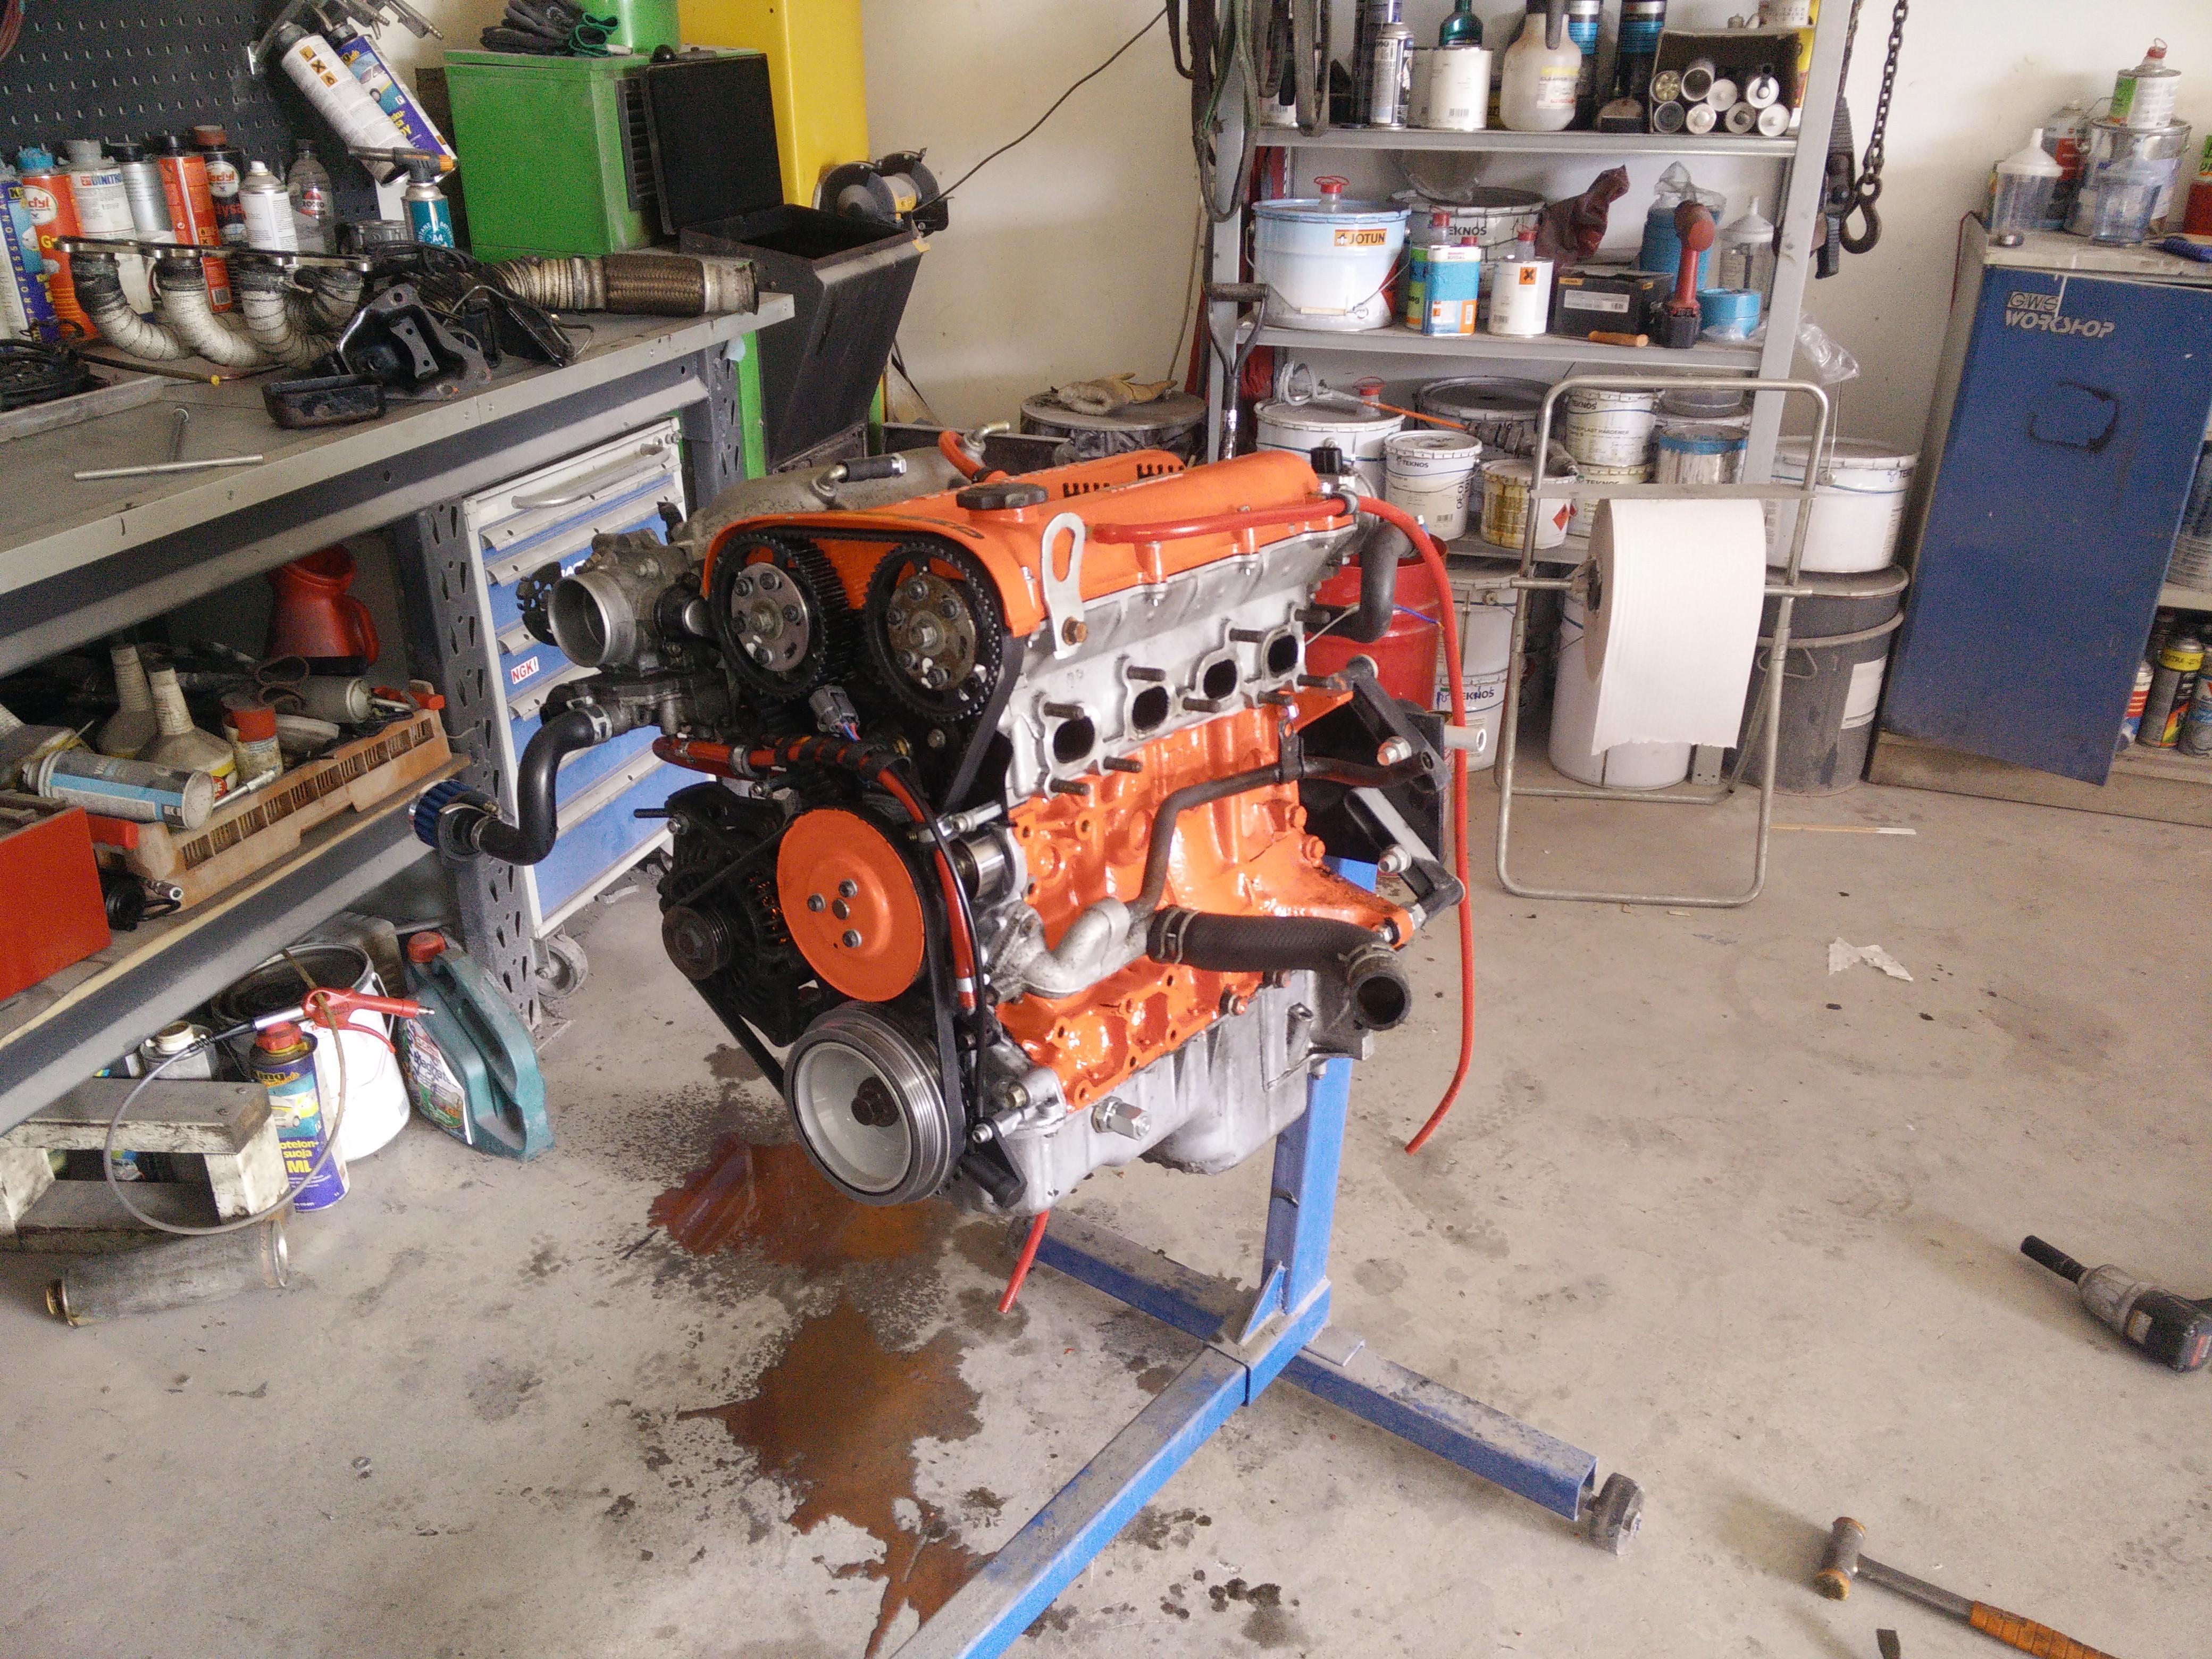 Time Attack Mazda BP 200bhp race engine built myself Unfortunately